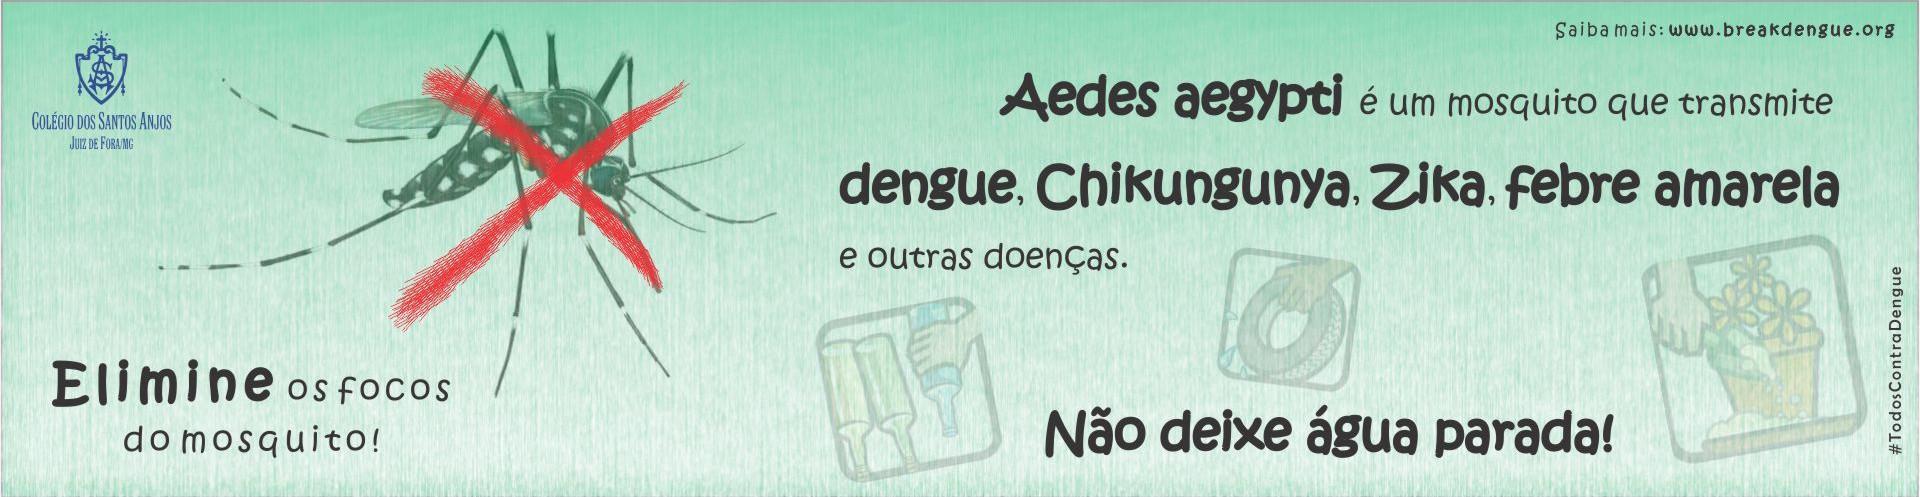 20160323_dengue_BANNER